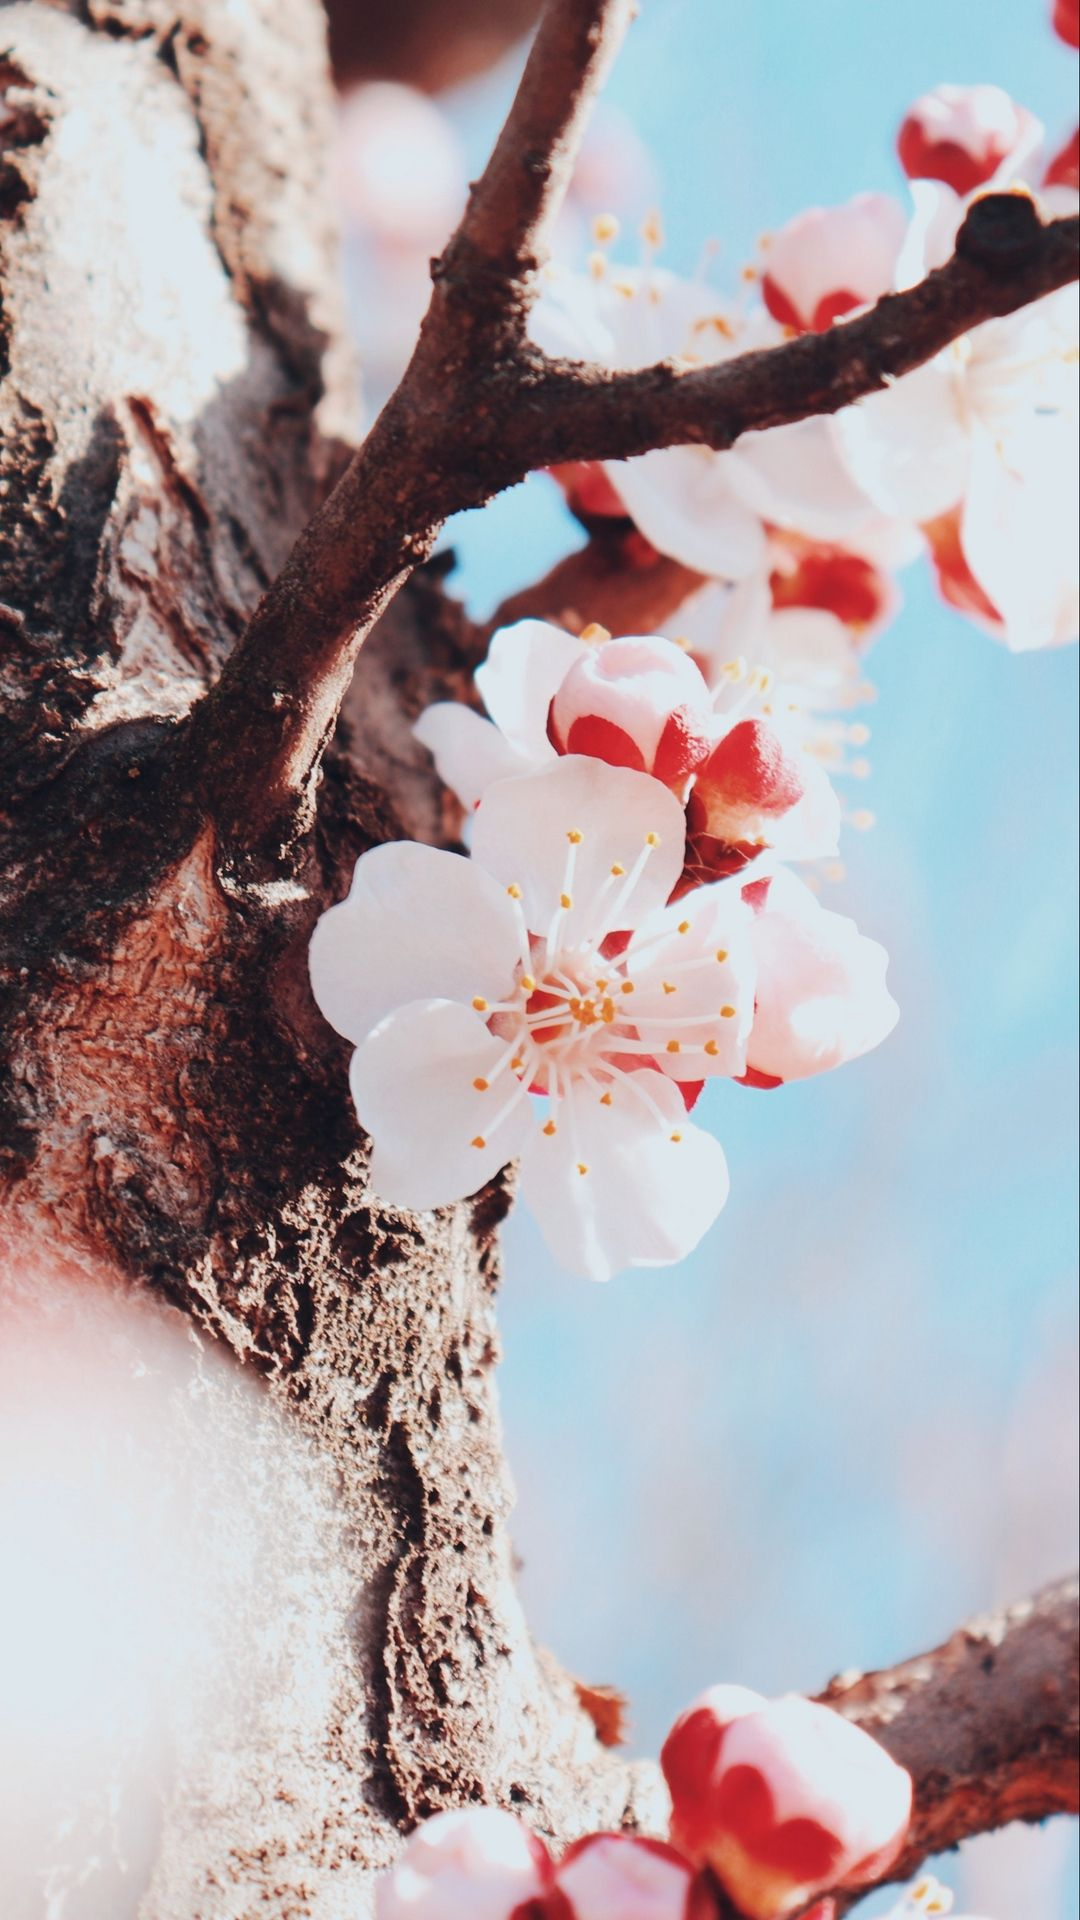 Flowering Apricot Photos